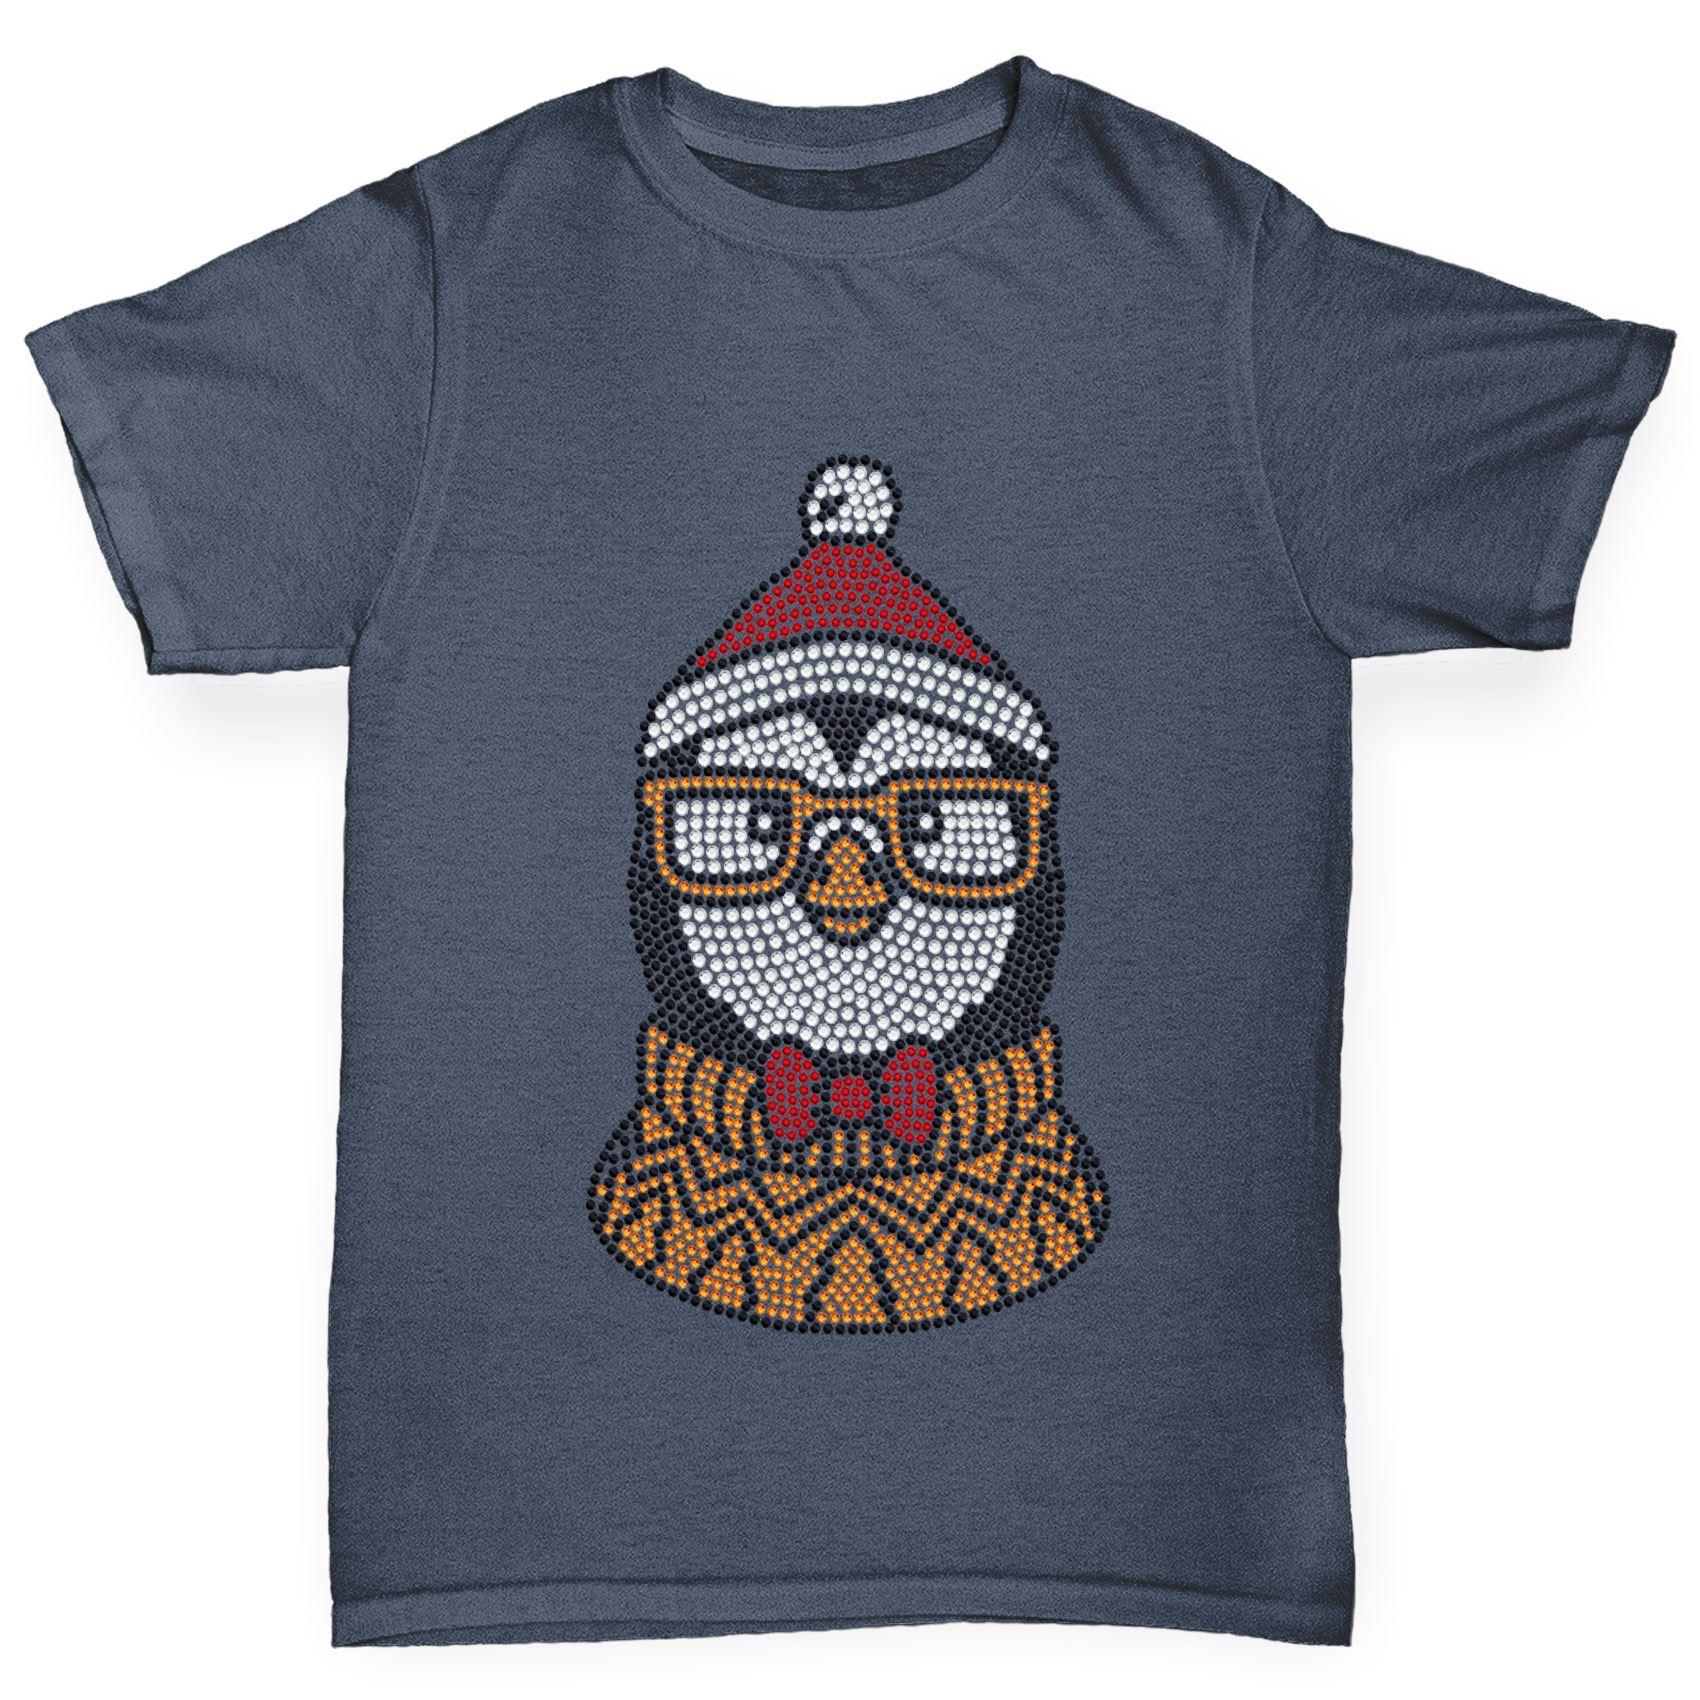 Twisted-Envy-Boy-039-s-Hipster-Xmas-Penguin-Rhinestone-T-Shirt